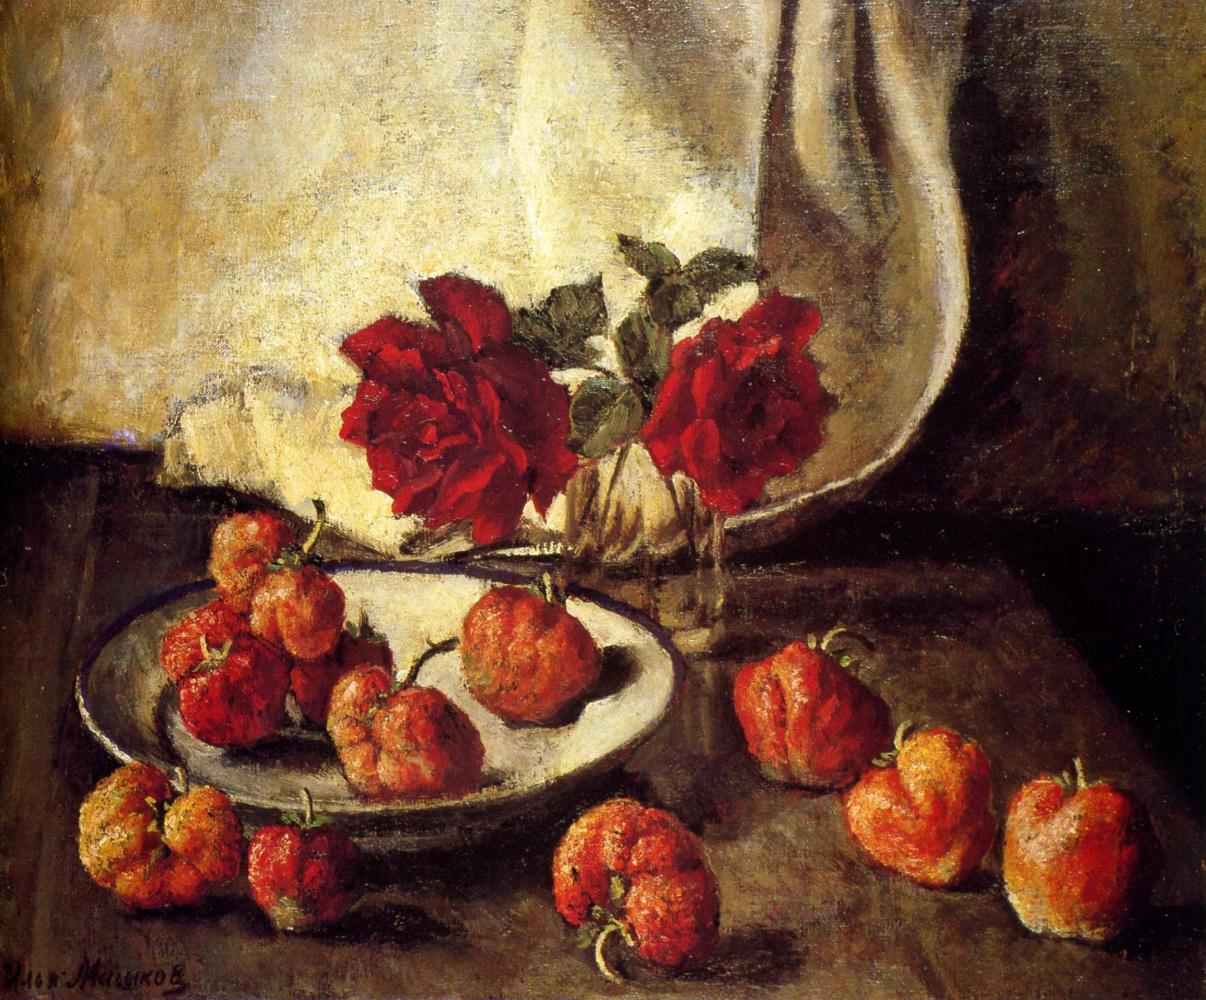 Ilya Ivanovich Mashkov. Two dark roses and a plate of strawberries